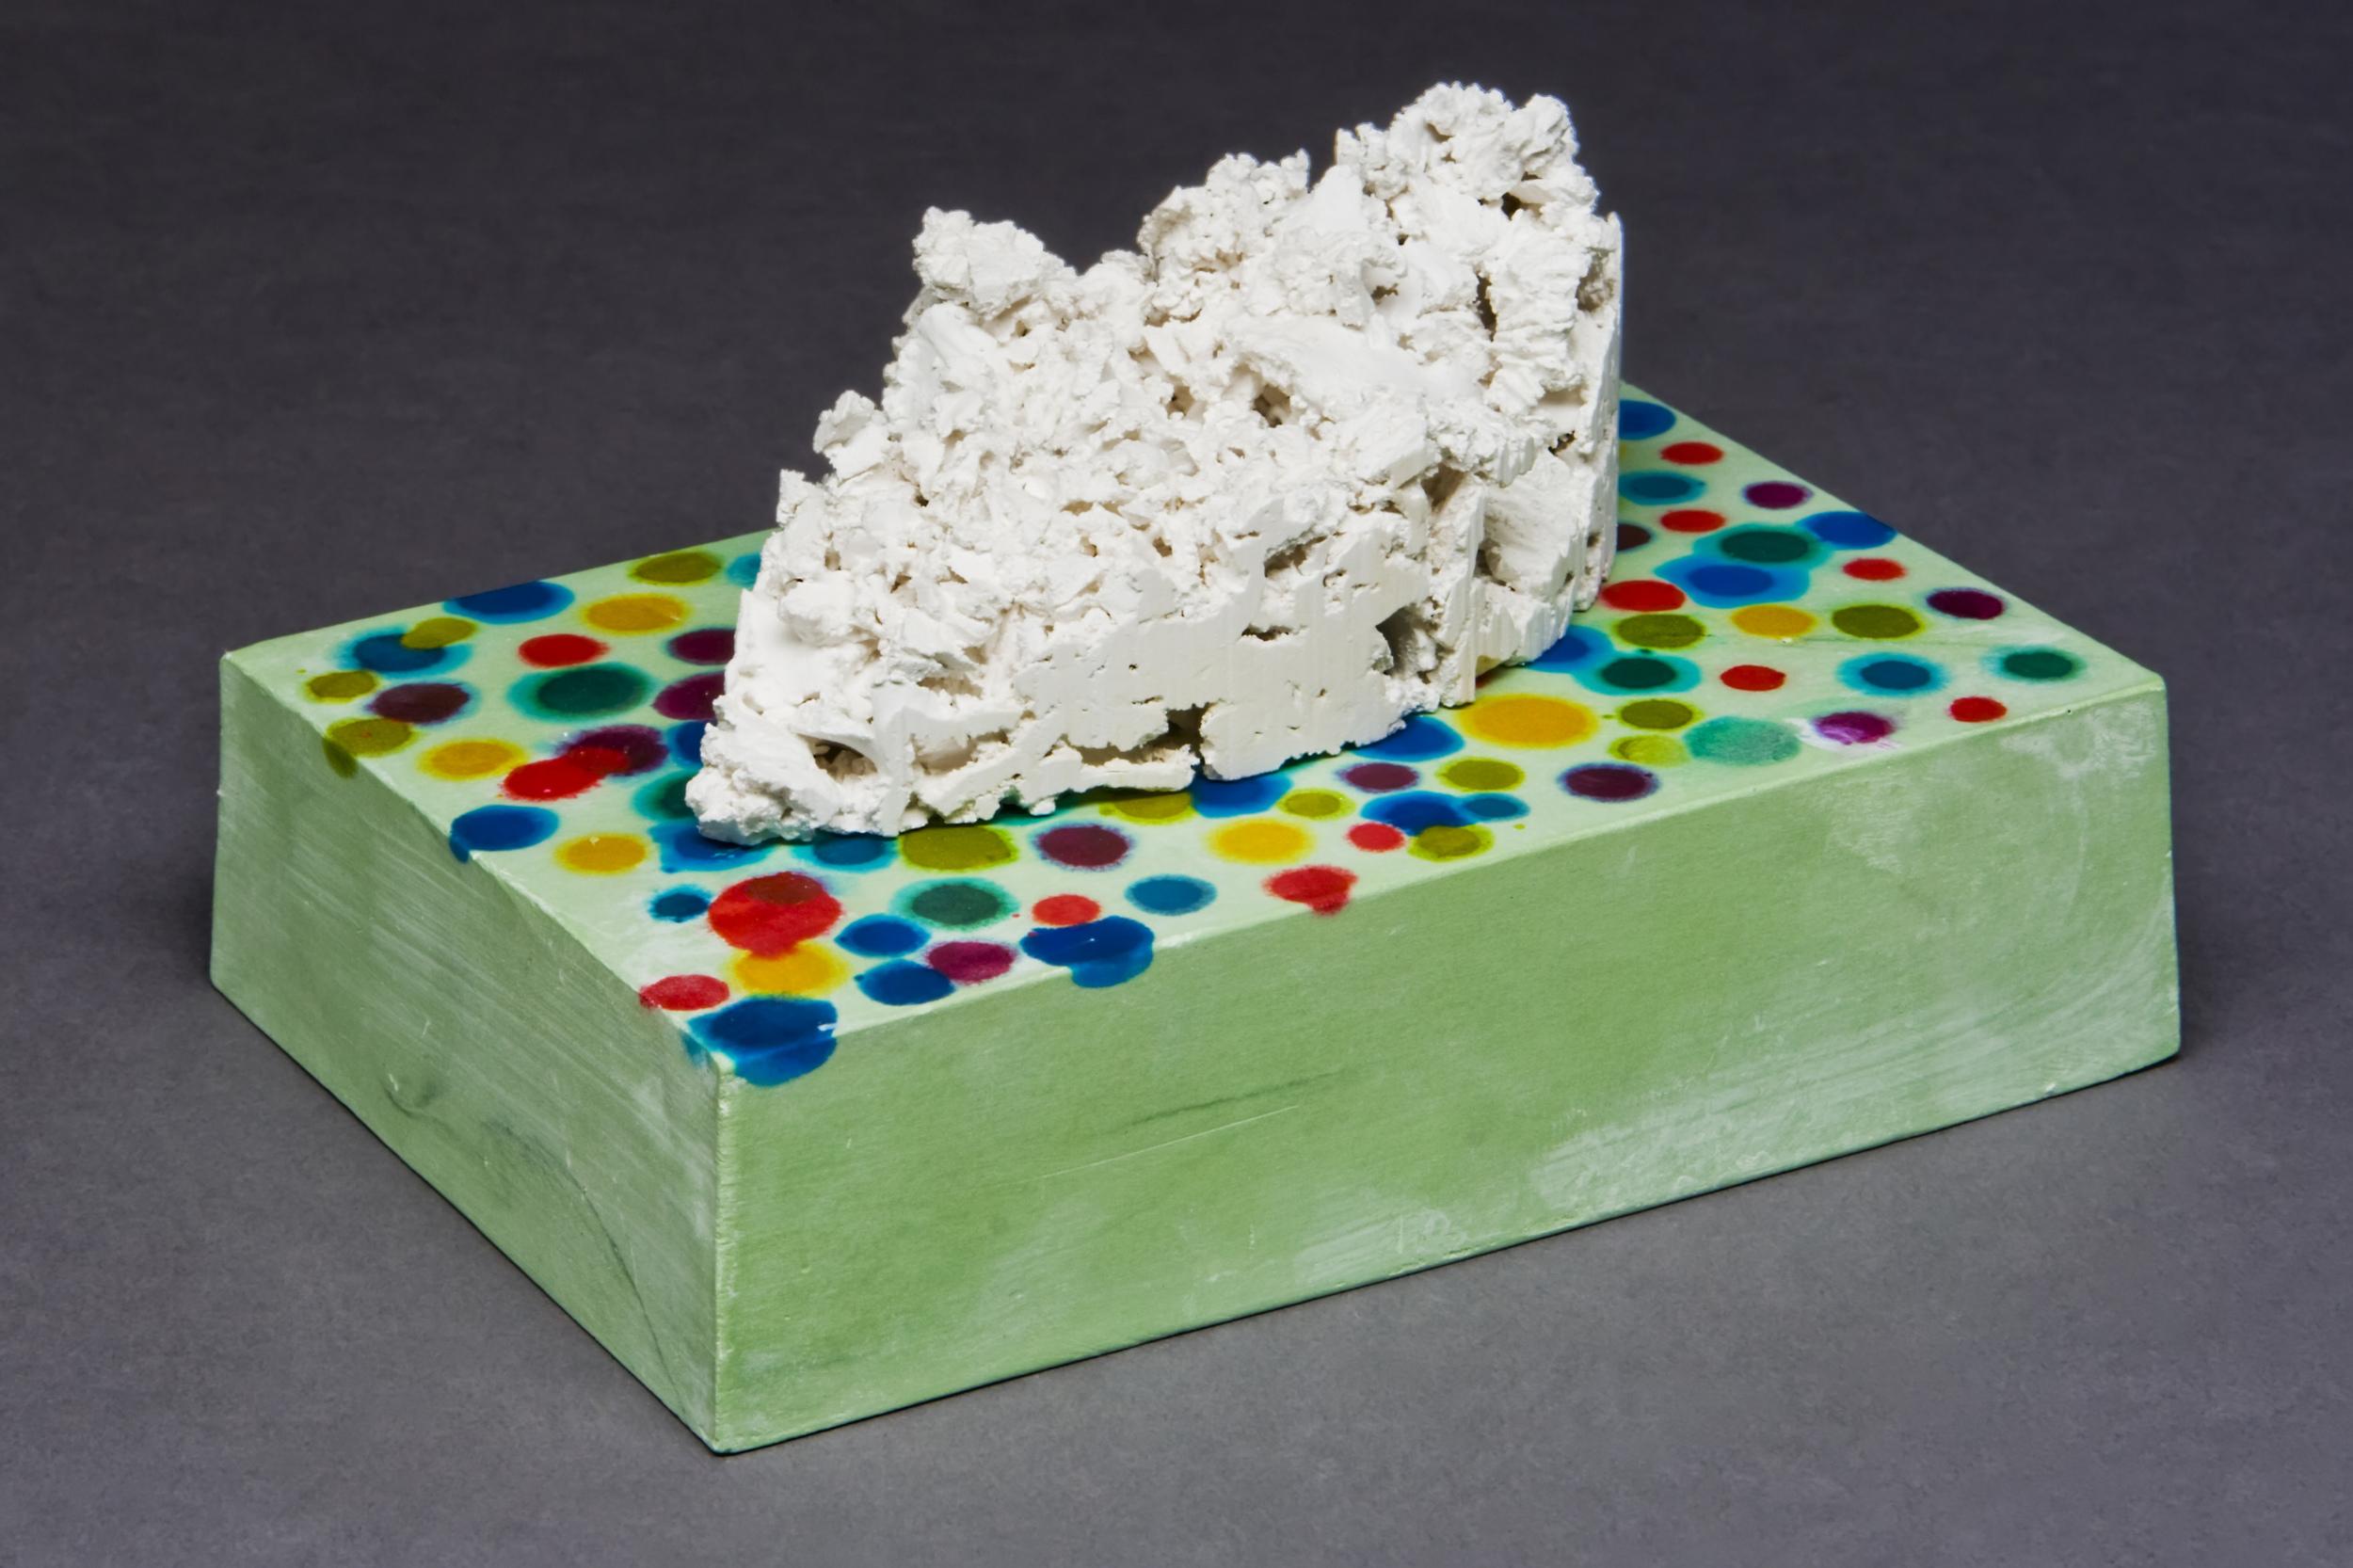 "Sweetsscape Component #1  Porcelain, glass, plaster, stain, wood, MDF, paint, epoxy, pins 4"" x 6"" x 4"" 2011 Photo Credit: Jim Walker"